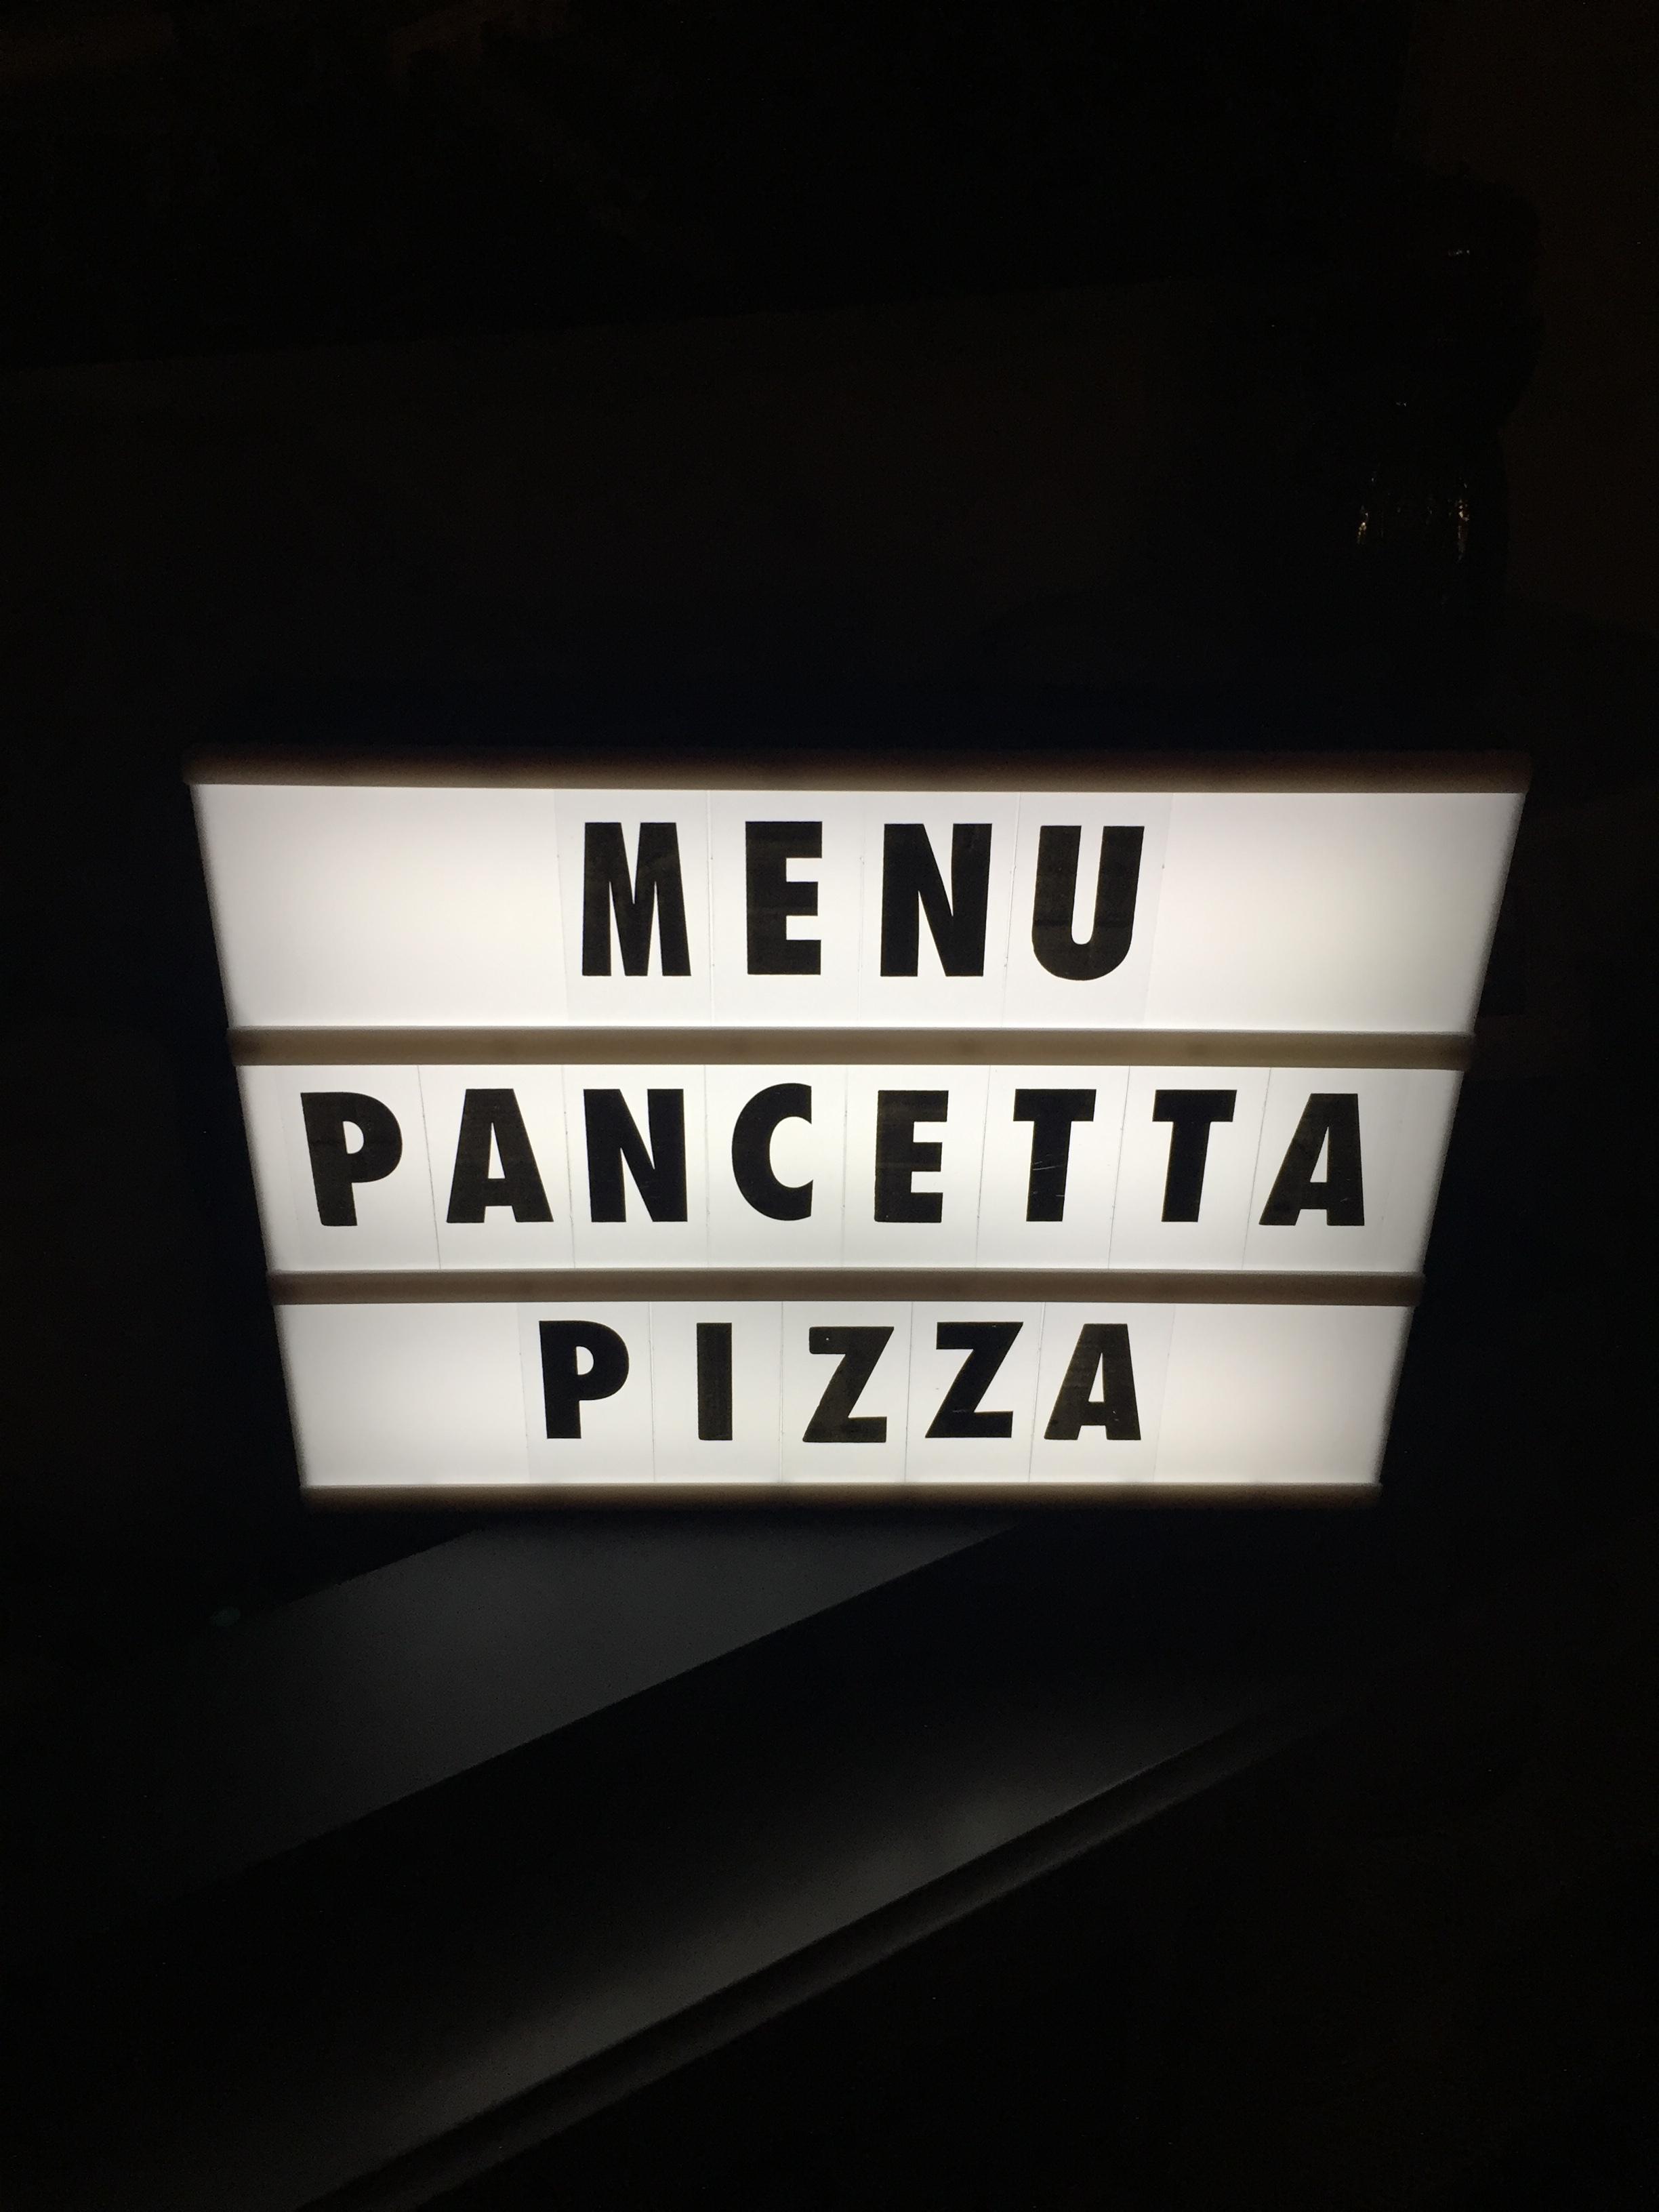 35PancettaPizza1.JPG